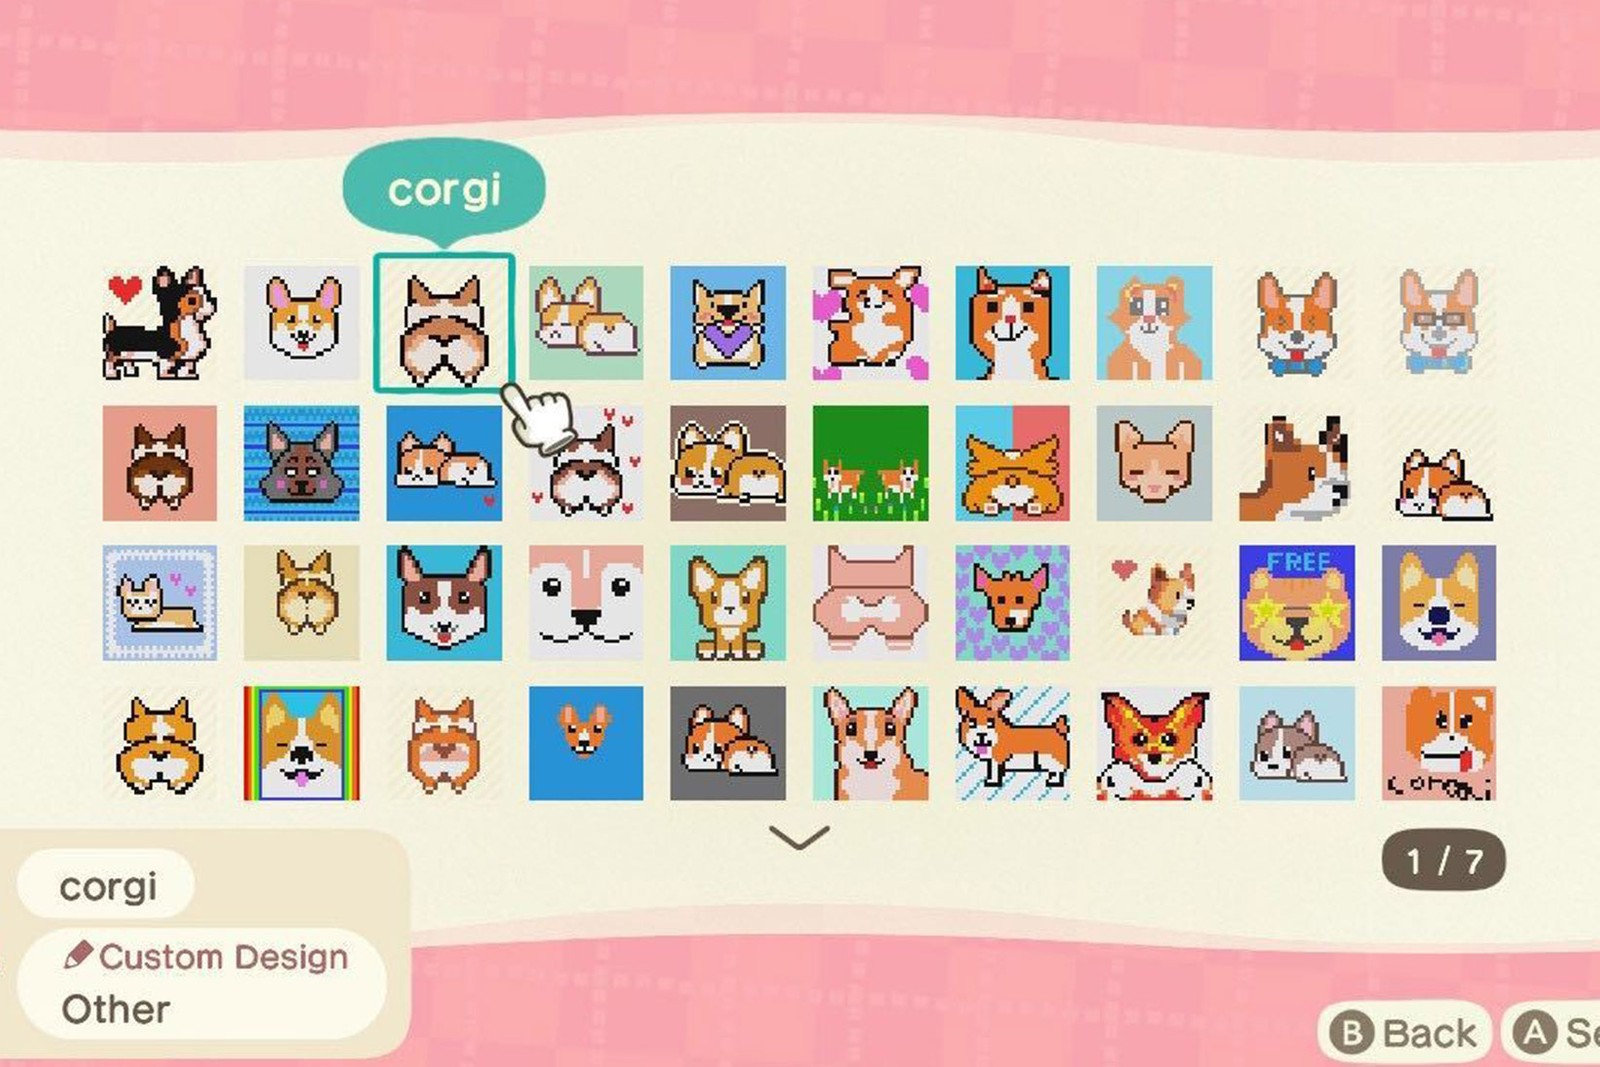 nintendo animal crossing update search custom designs corgi dog puppy